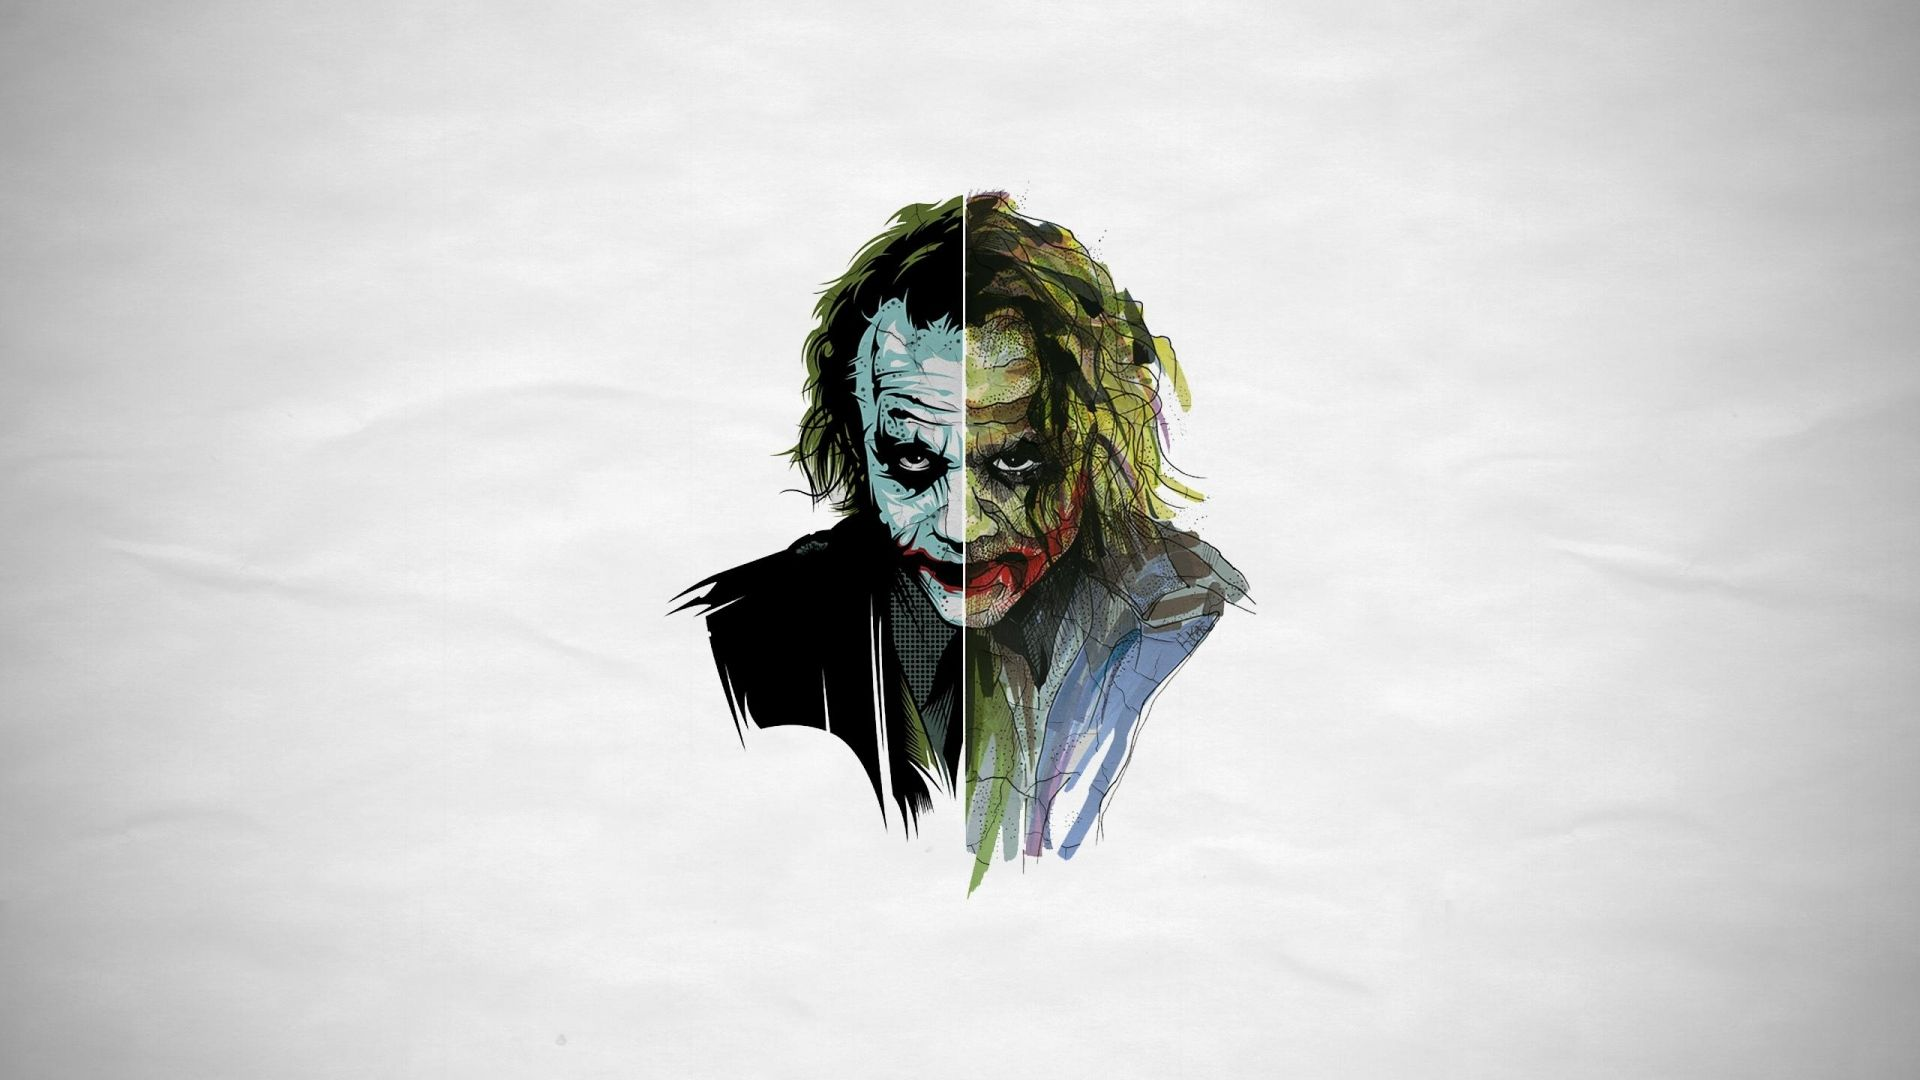 Full Hd 1080p Joker Wallpapers Hd Desktop Backgrounds 1920x1080 Joker Hd Wallpaper Joker Wallpapers Hd Wallpapers 1080p Dark theme 1080p joker hd mobile